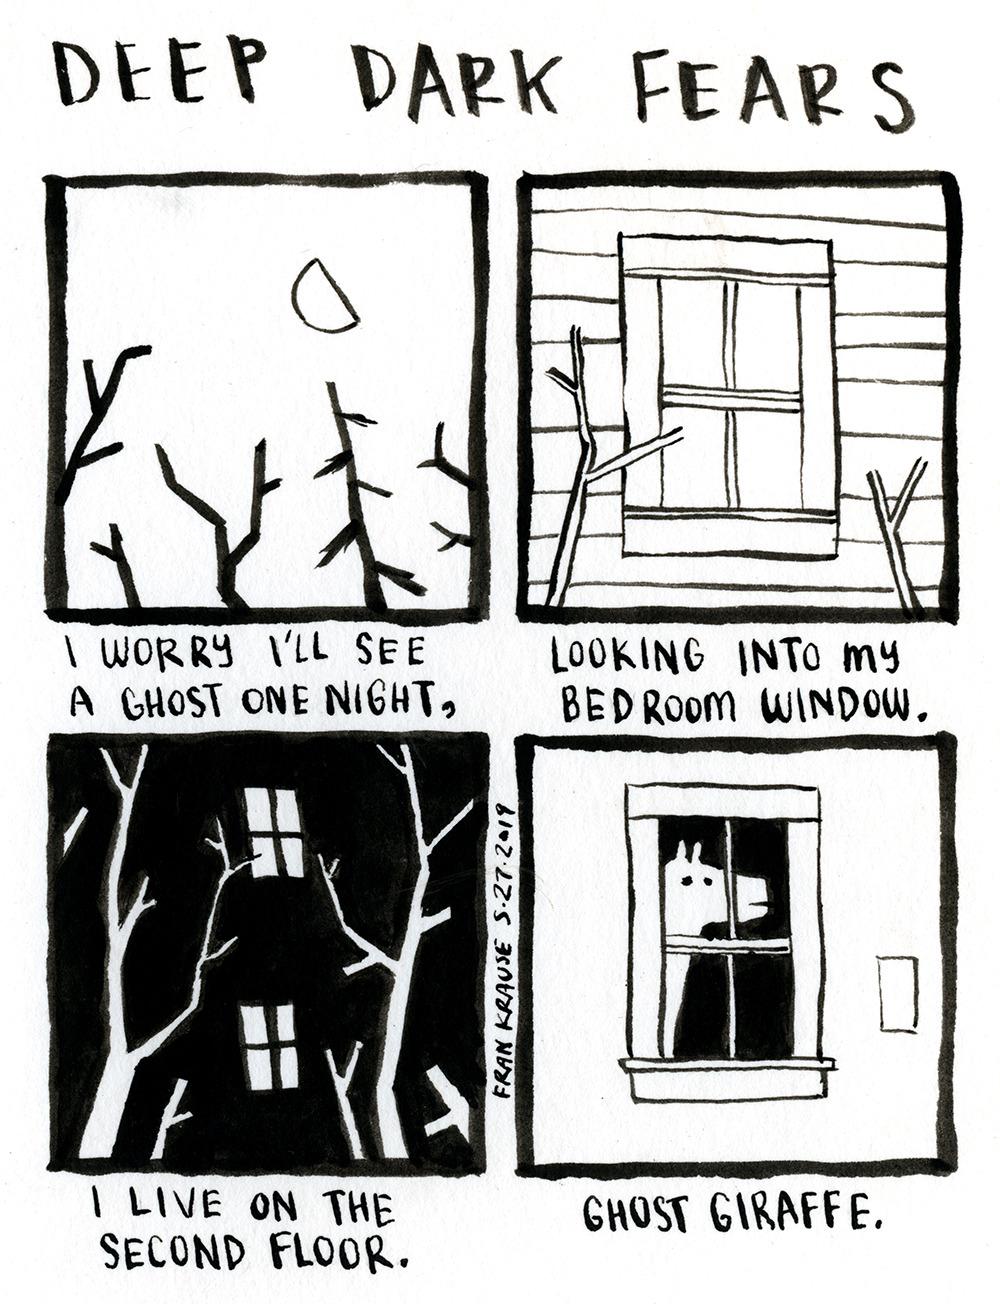 deep dark fears they